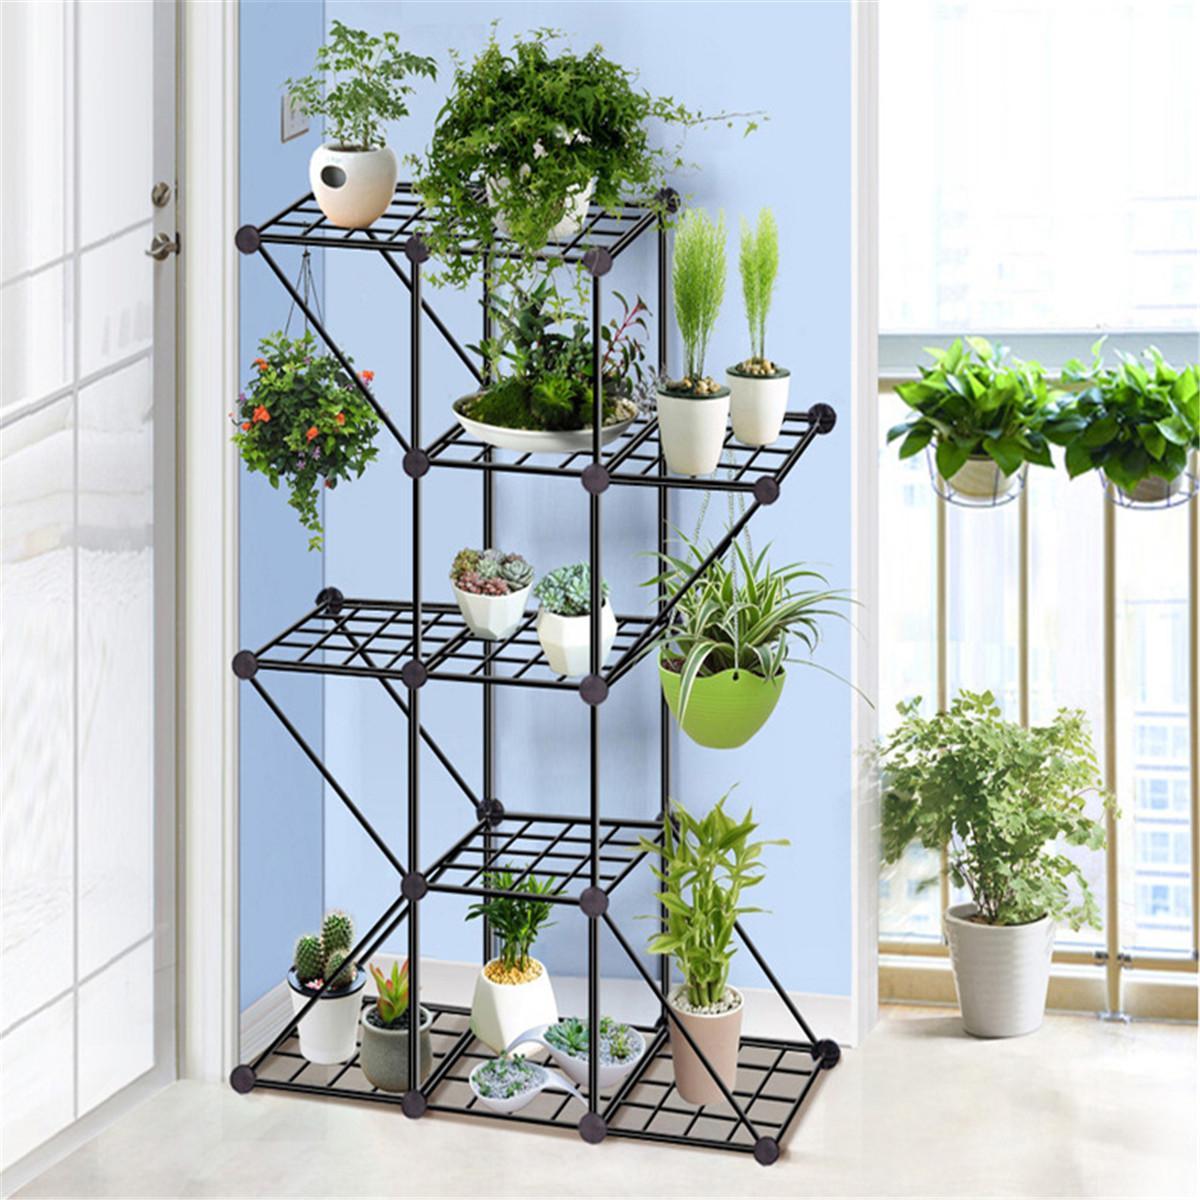 Wrought Iron Balcony Living Room Interior Modern Decoration Floor-standing Multi-layer Flower Shelf Storage Flower Pot Shelf